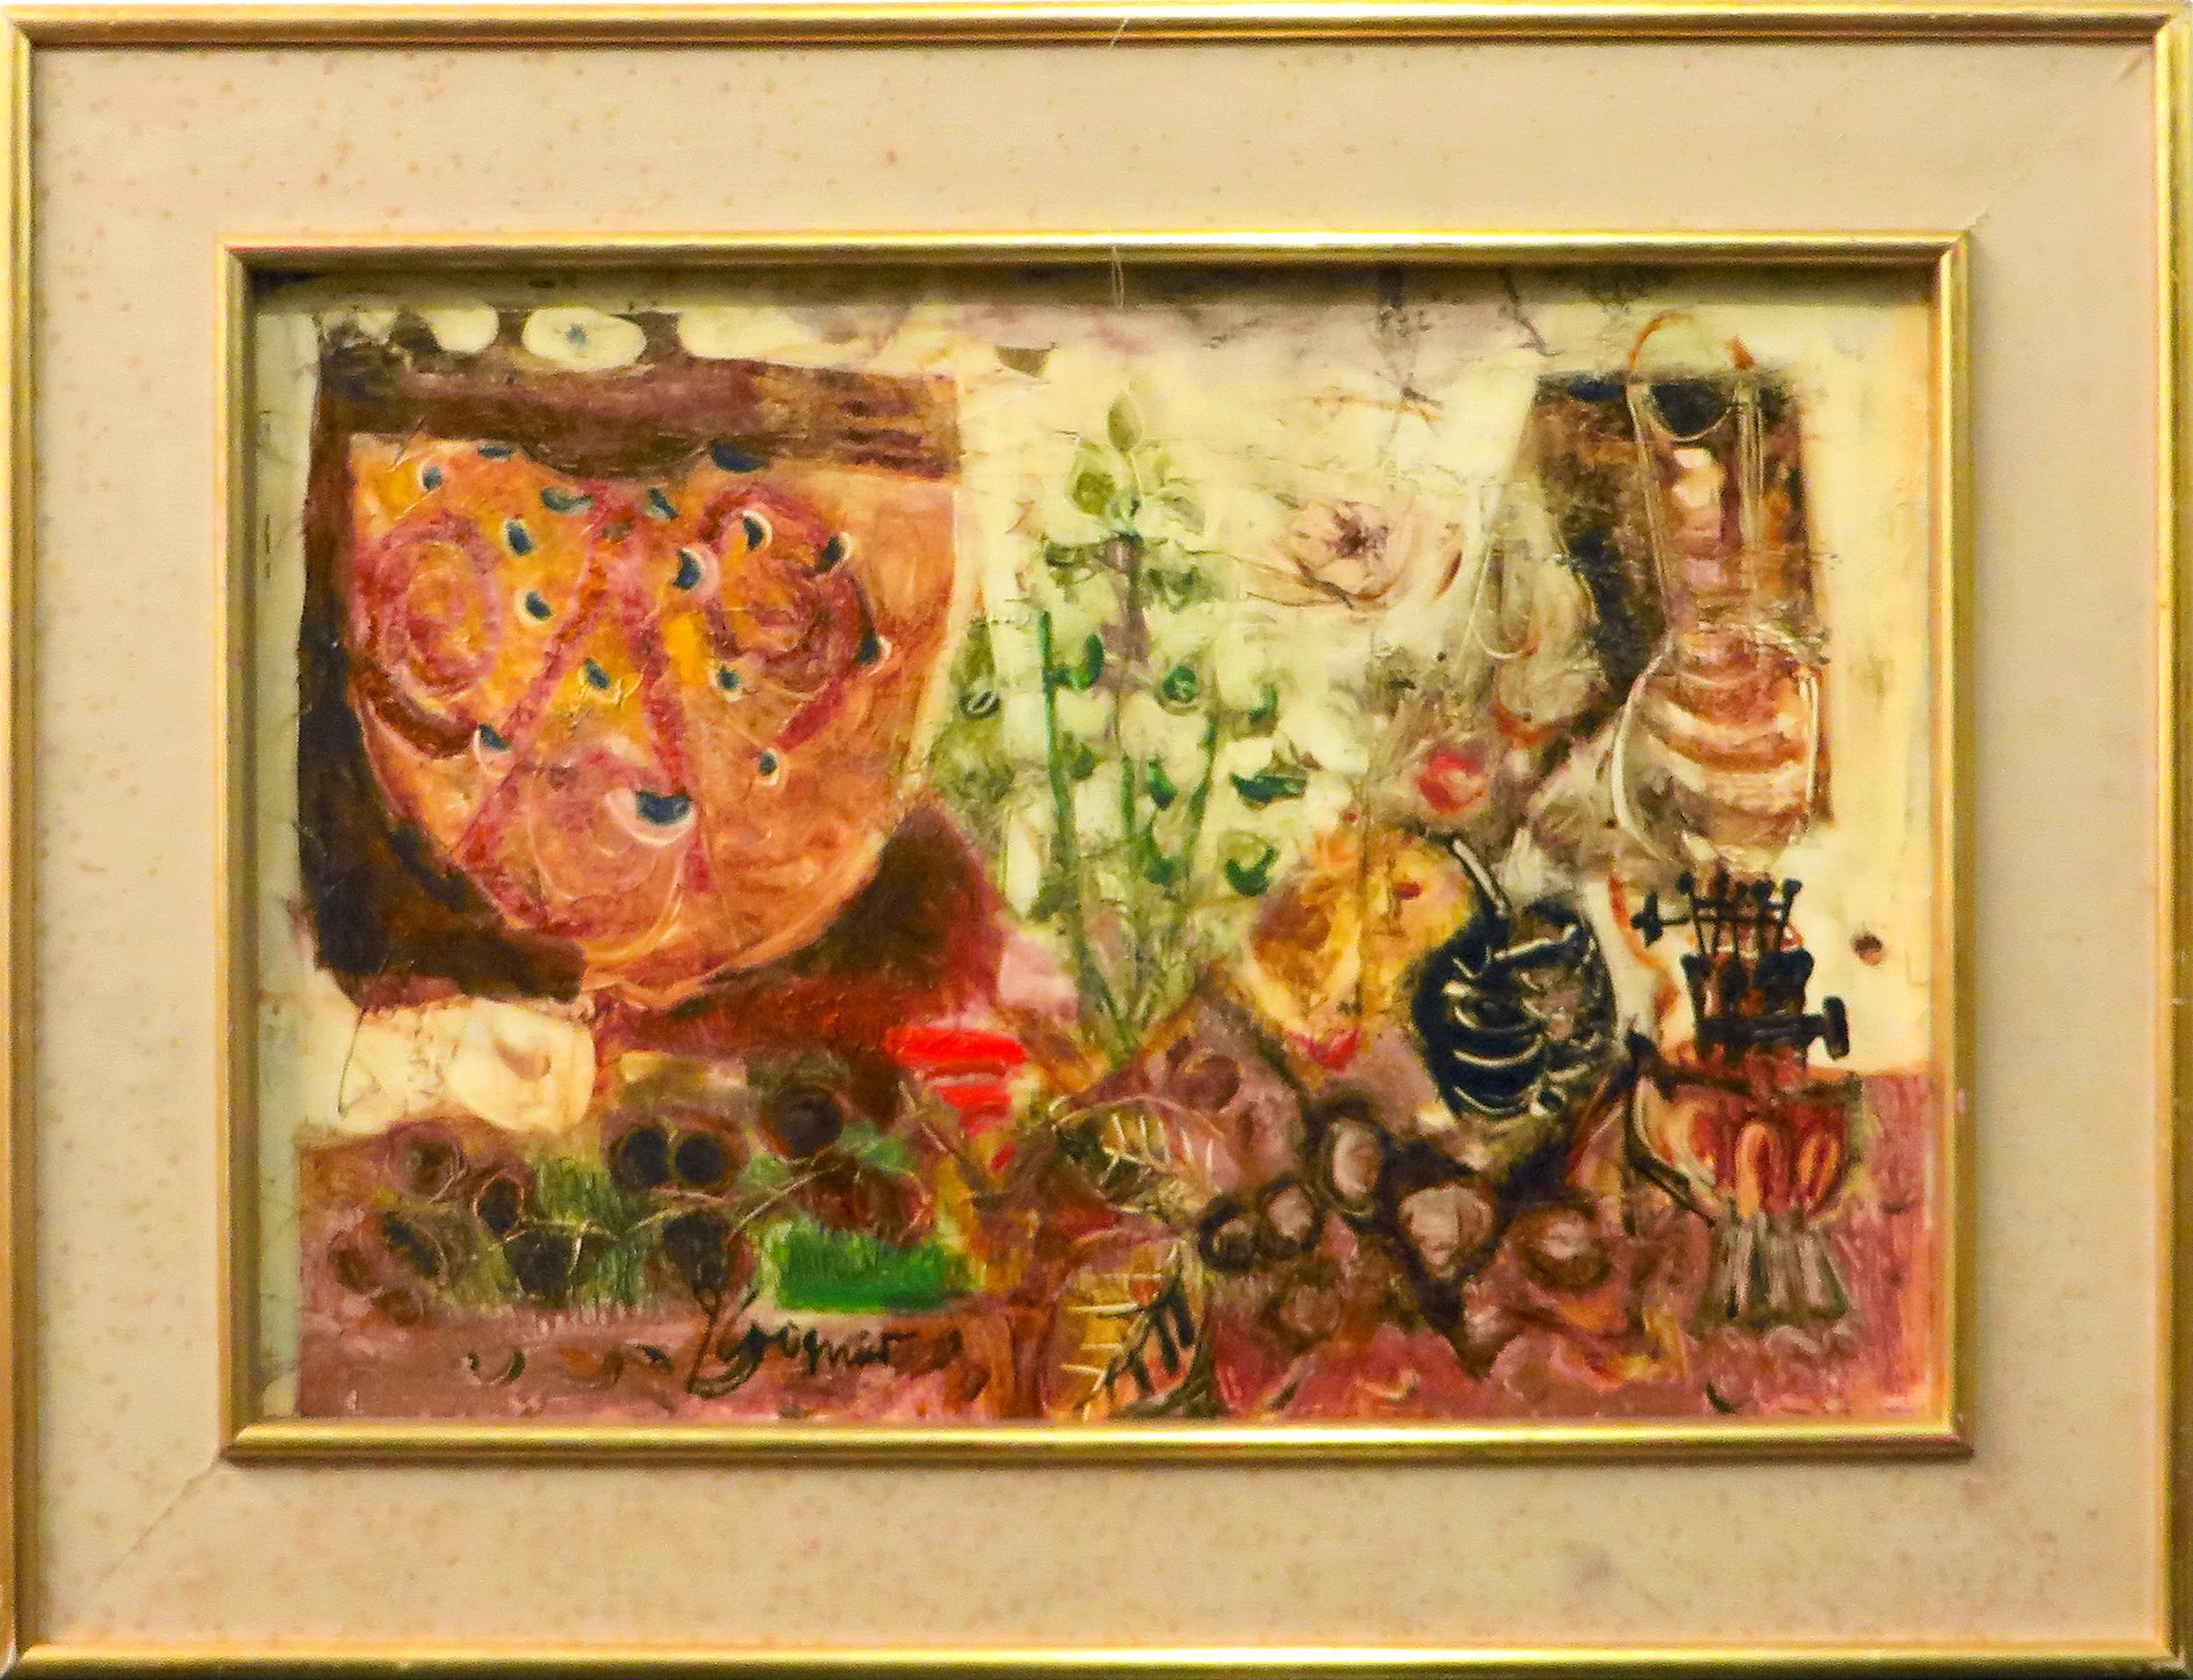 James Coignard, Still Life with Oil Lamp, Oil Painting